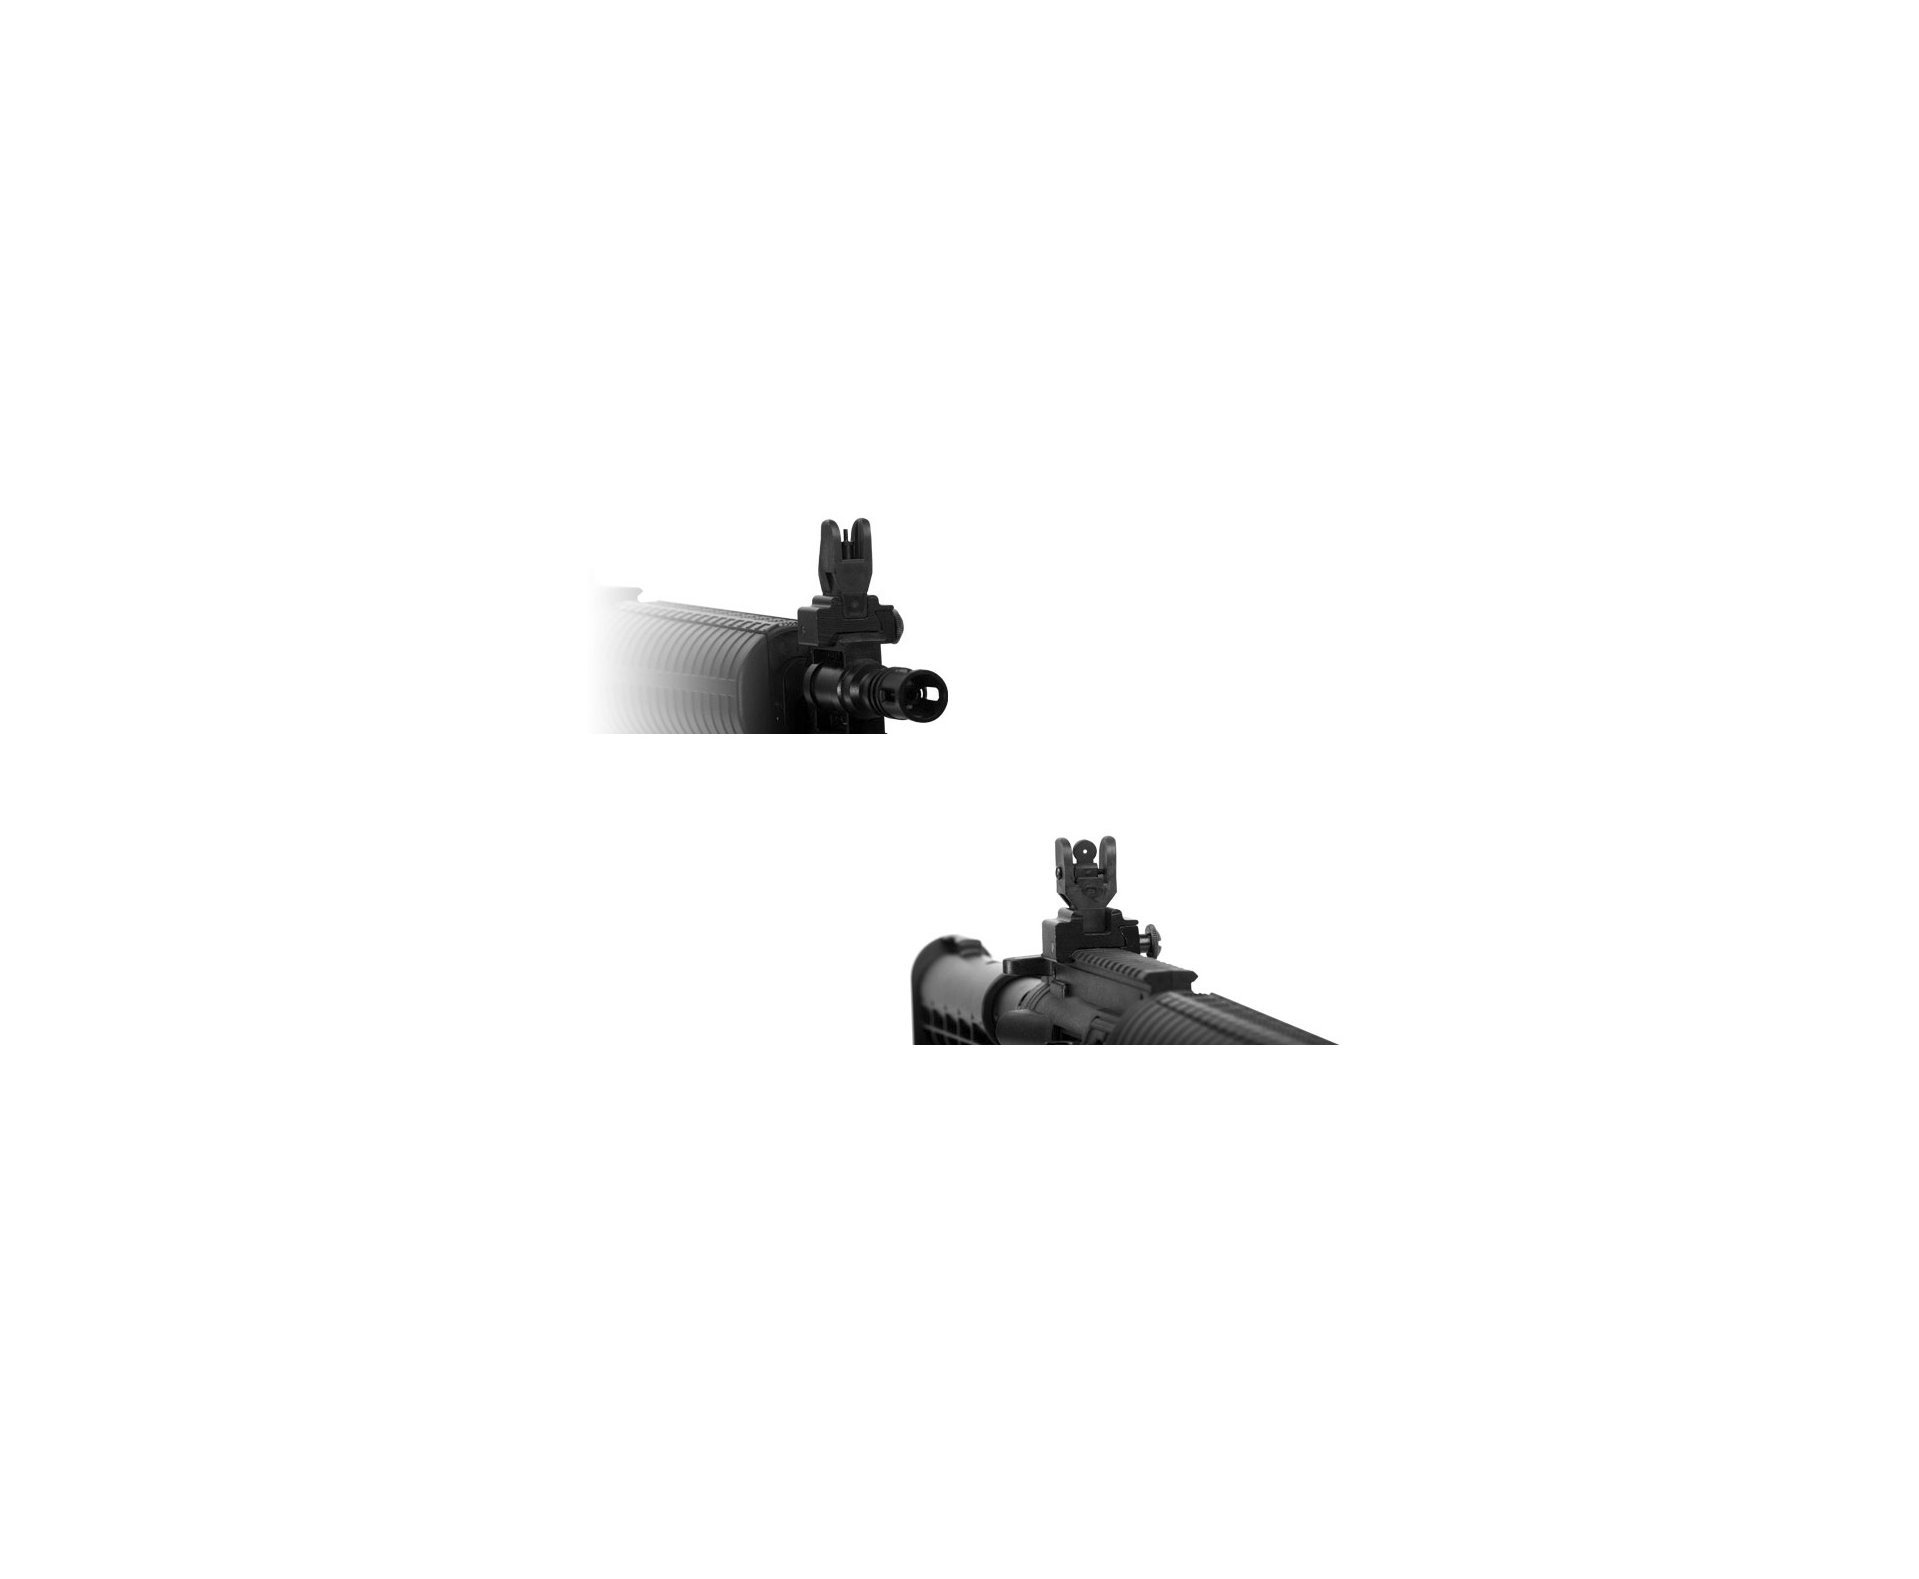 Carabina De Ar Crosman M4-177 Multi Pump - Calibre 4,5 Mm